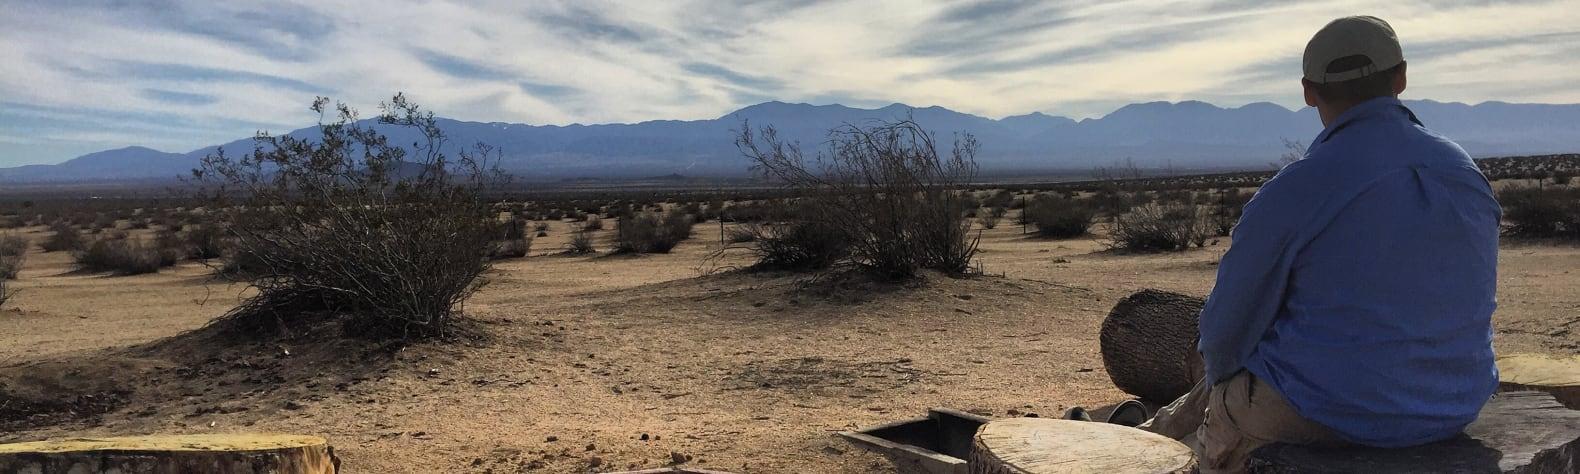 Camp Desert Dawgs